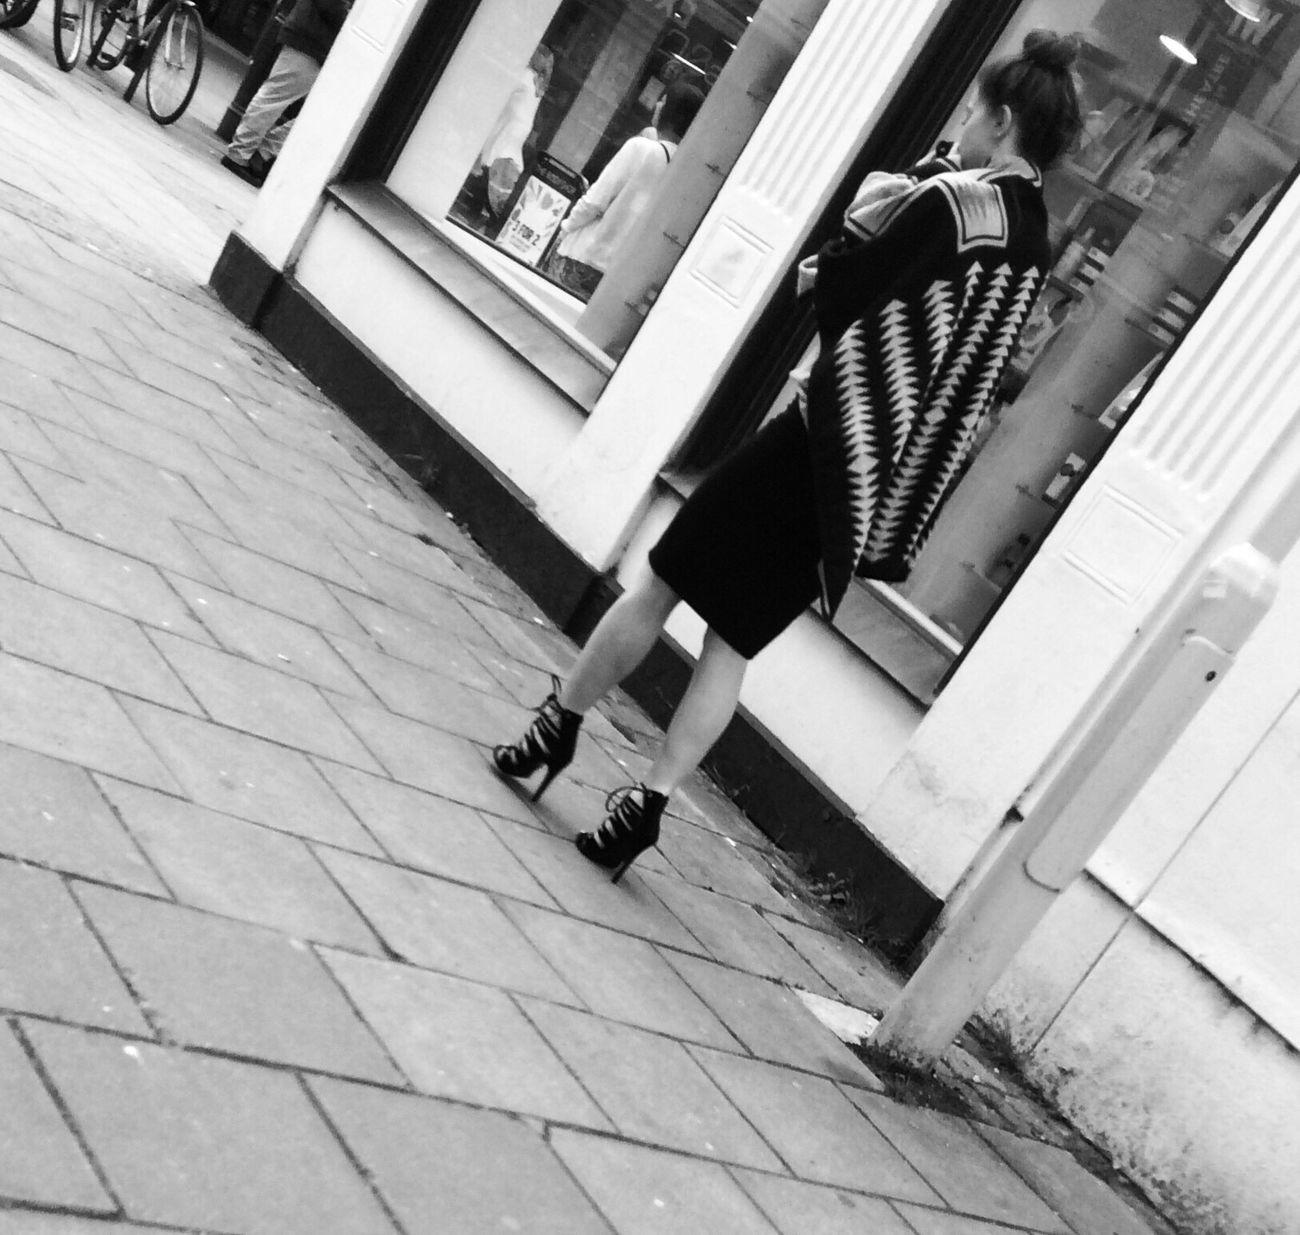 Blackandwhite Photography Streetphotography Monochrome